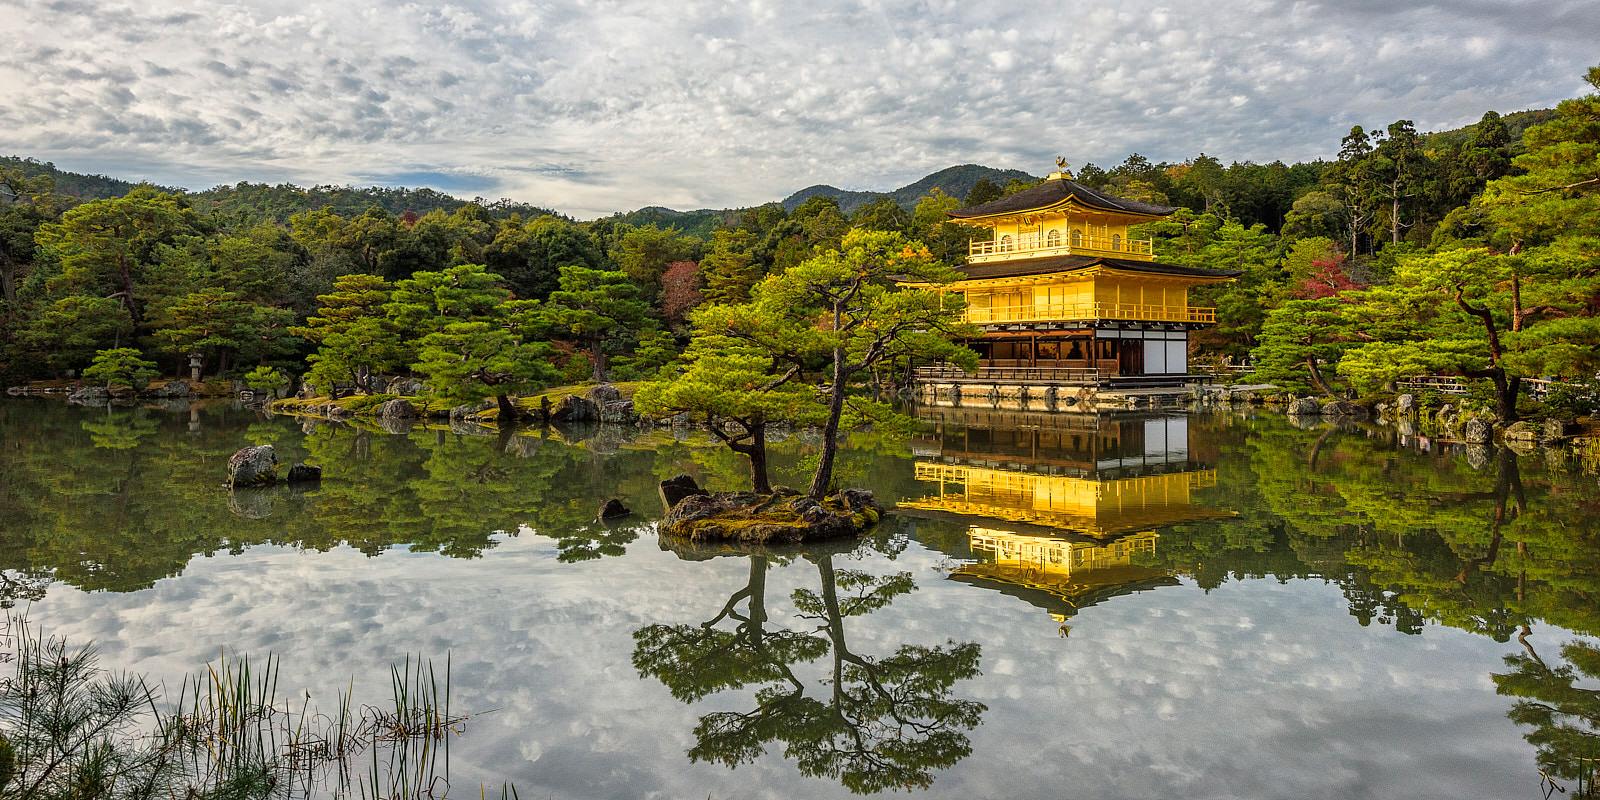 Golden Kinkaku-ji temple reflects on the water in Kyoto, Japan